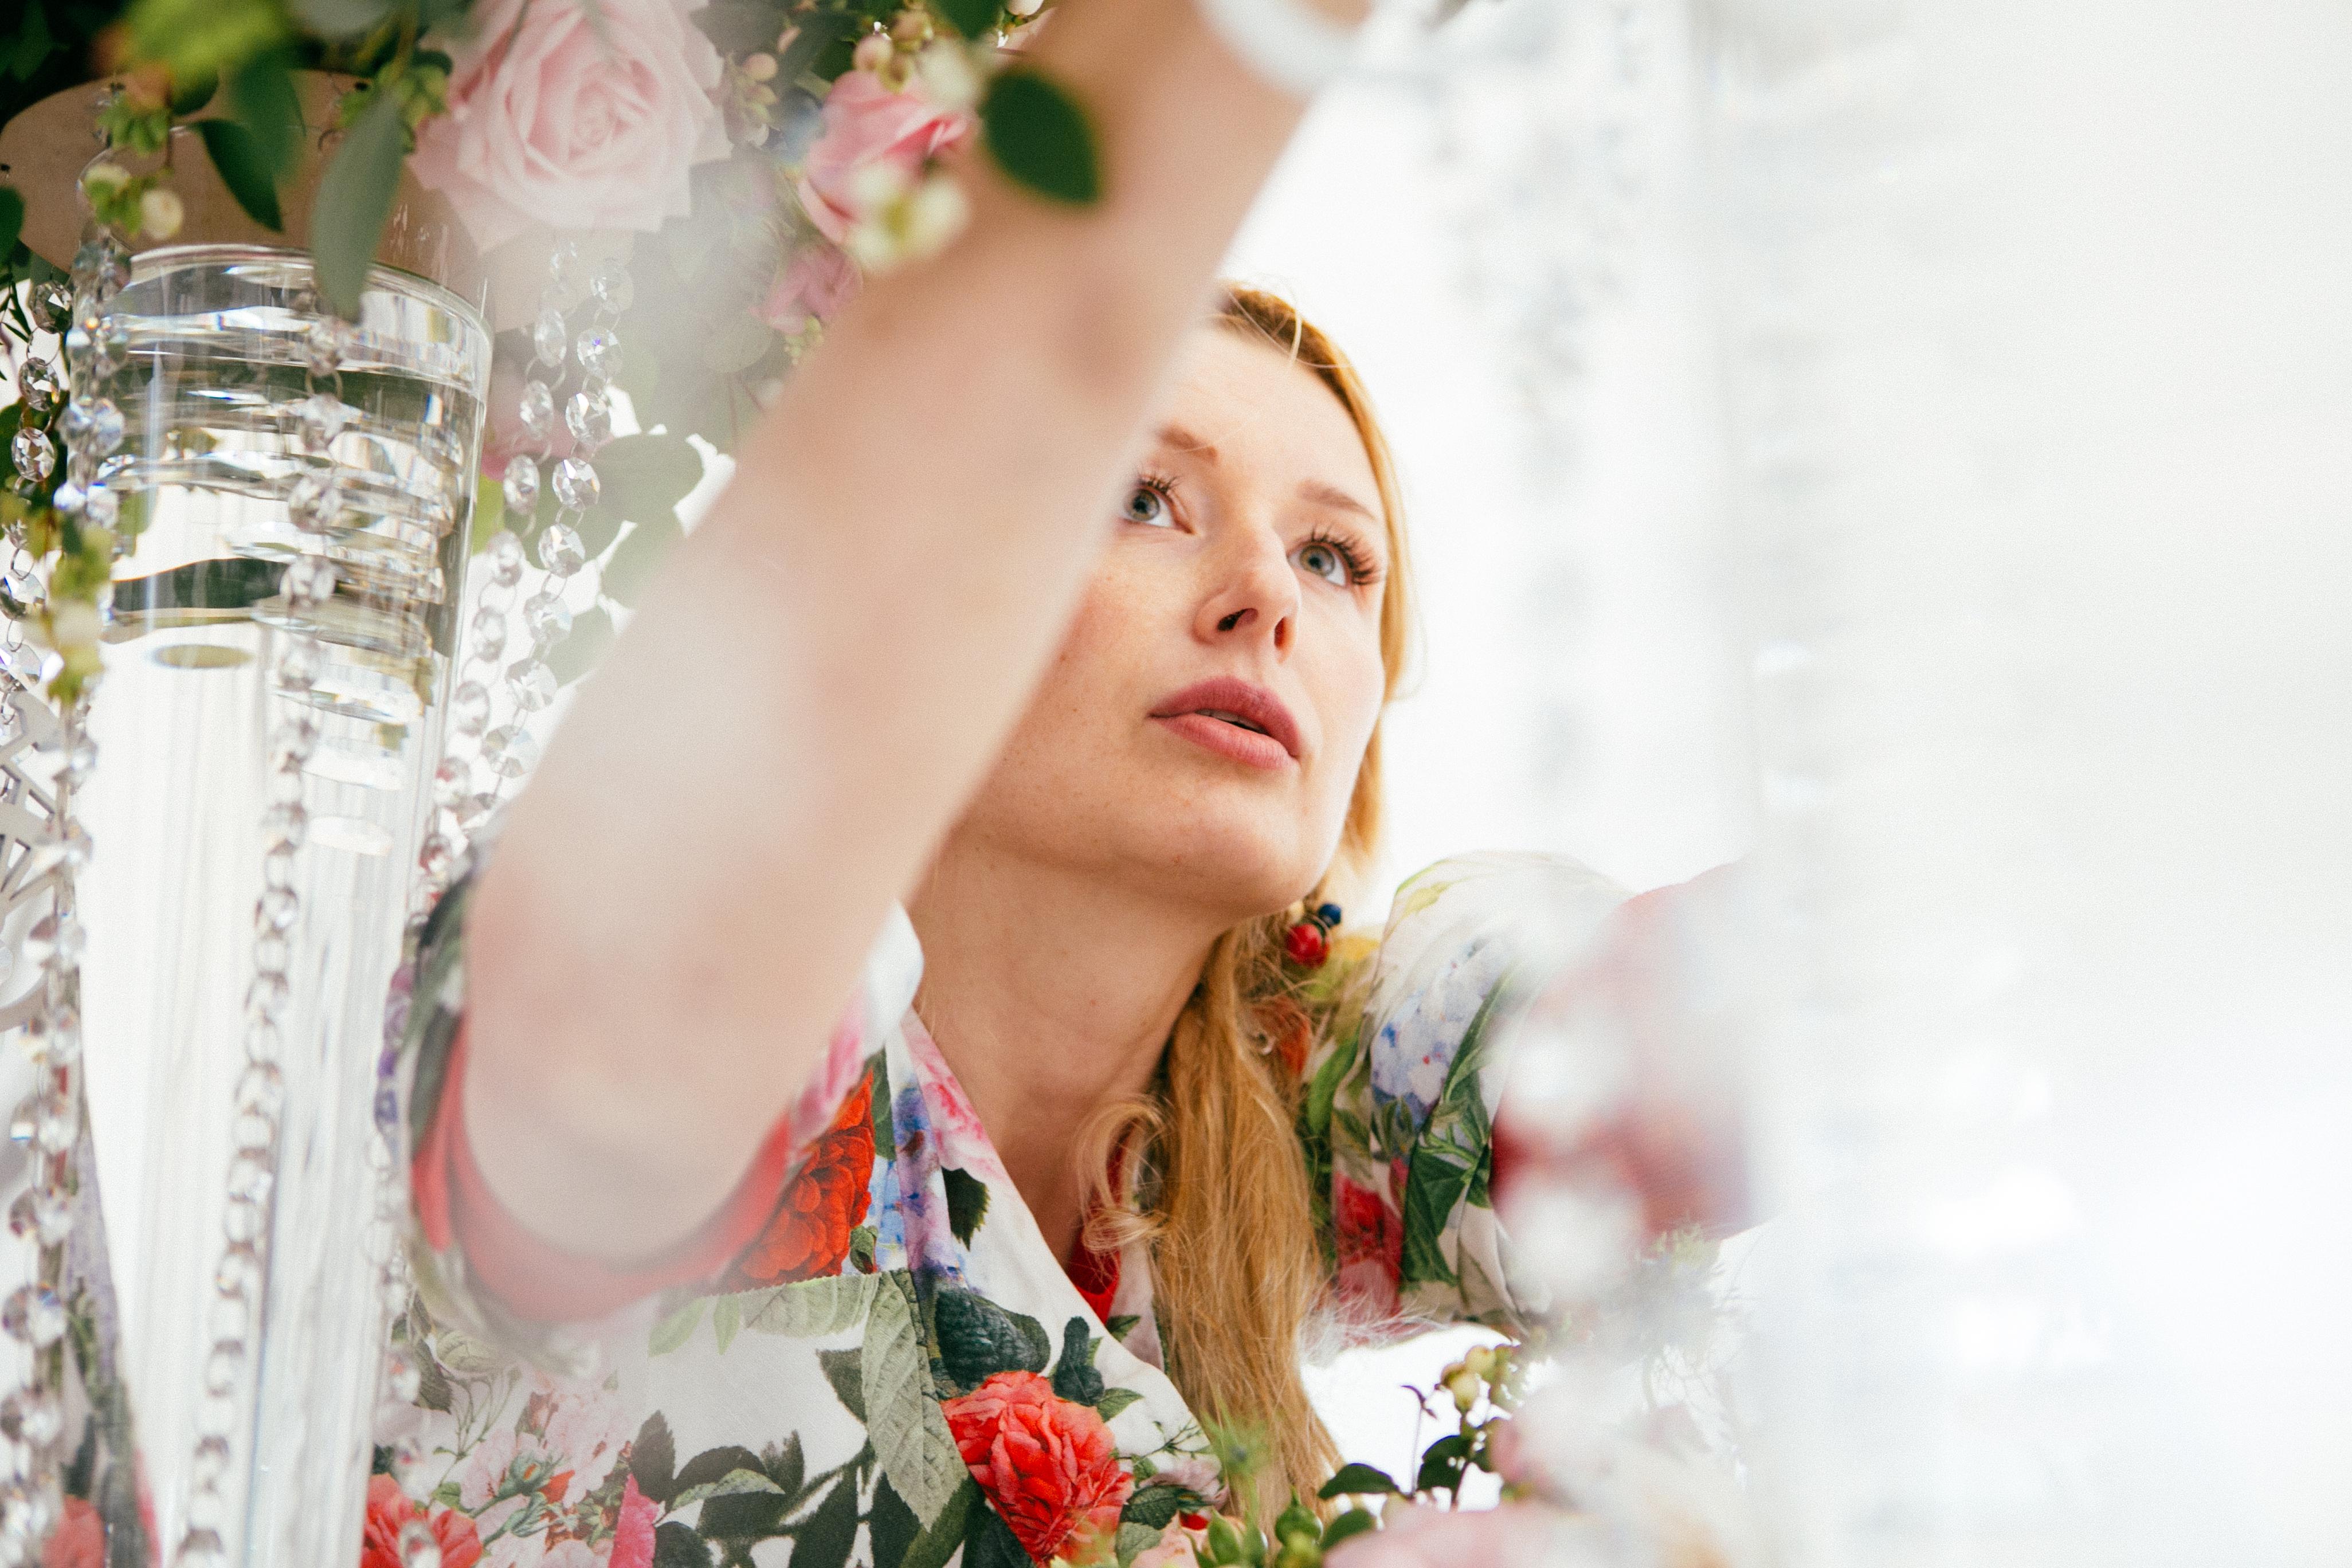 Флорист-Декоратор Илона Верис